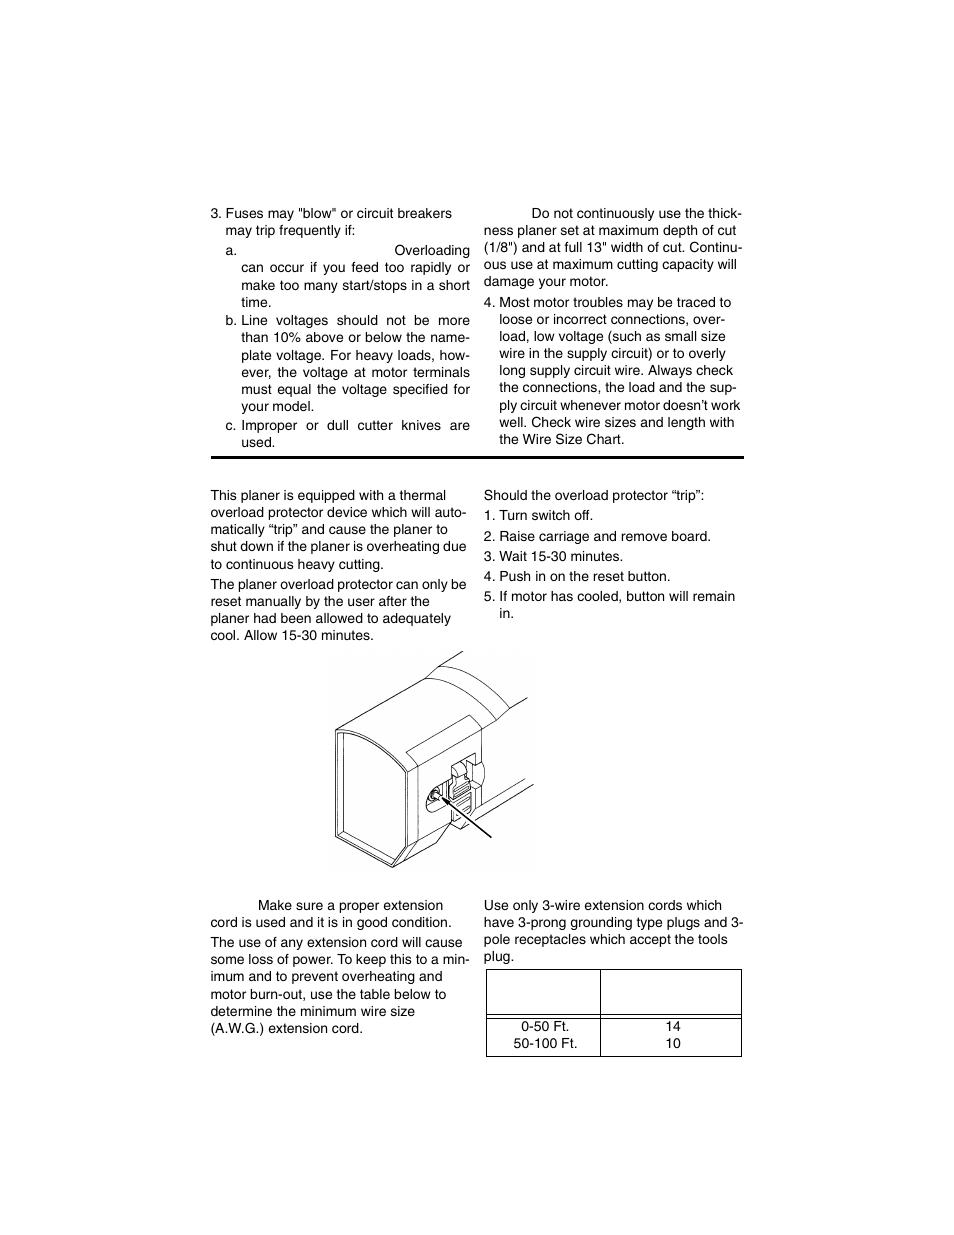 thermal overload protector wire sizes ridgid tp1300 user manual rh manualsdir com